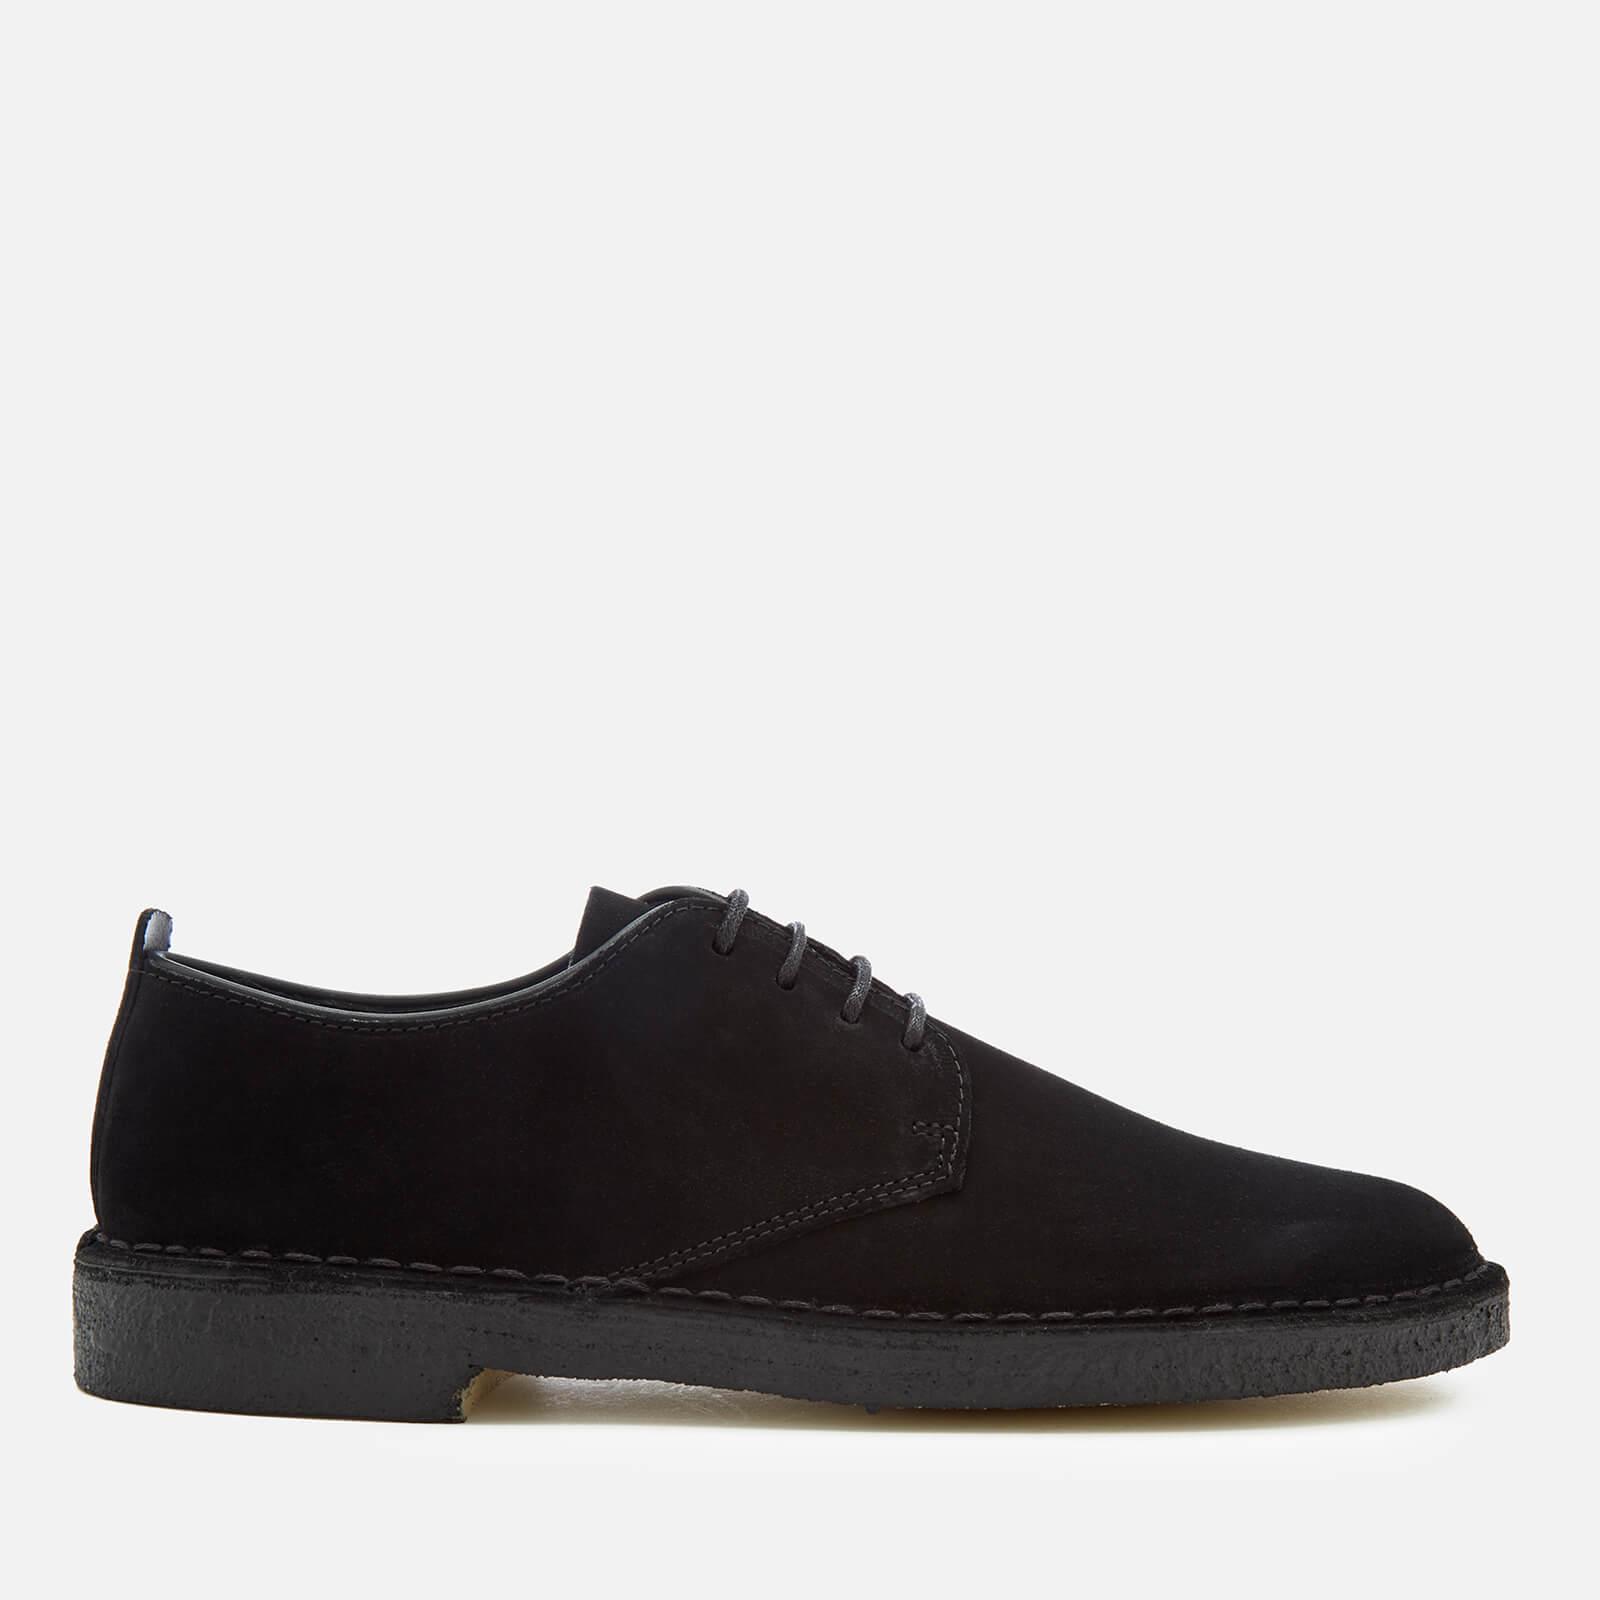 Clarks Originals Men's Desert London Shoes - Black - UK 11 - Black